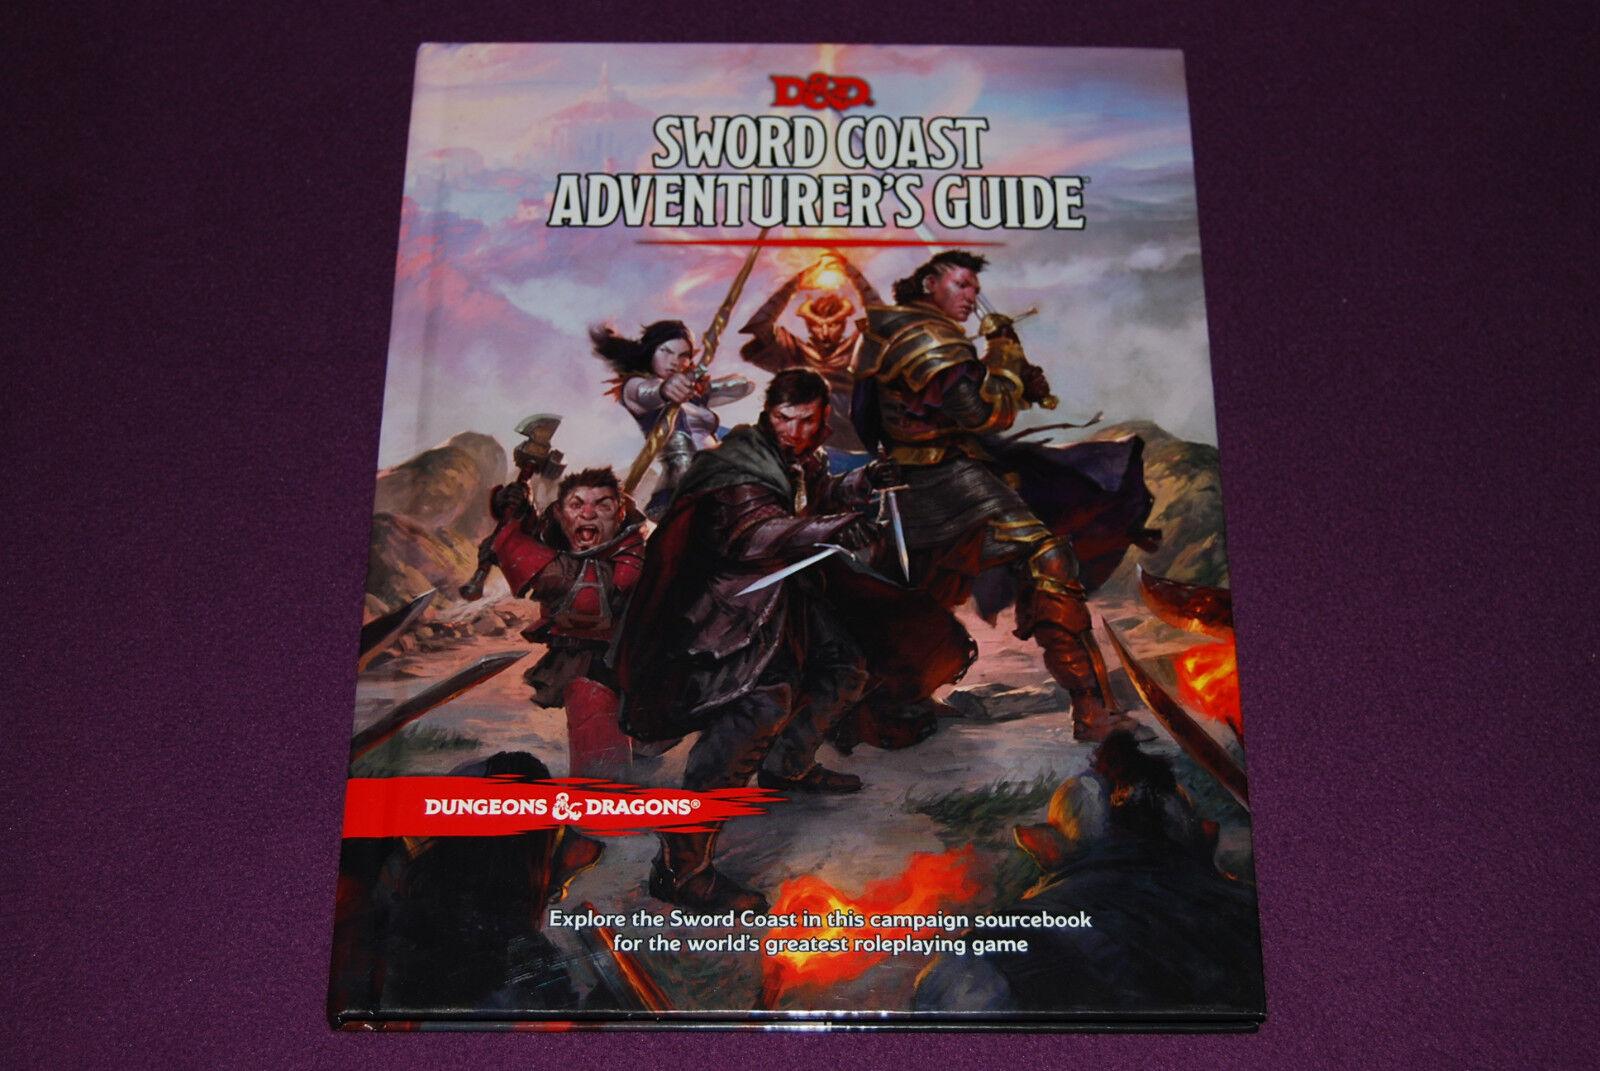 D&D DUNGEONS & DRAGONS 5 RPG JDR Jeu de Role - Sword Coast Adventurer's Guide